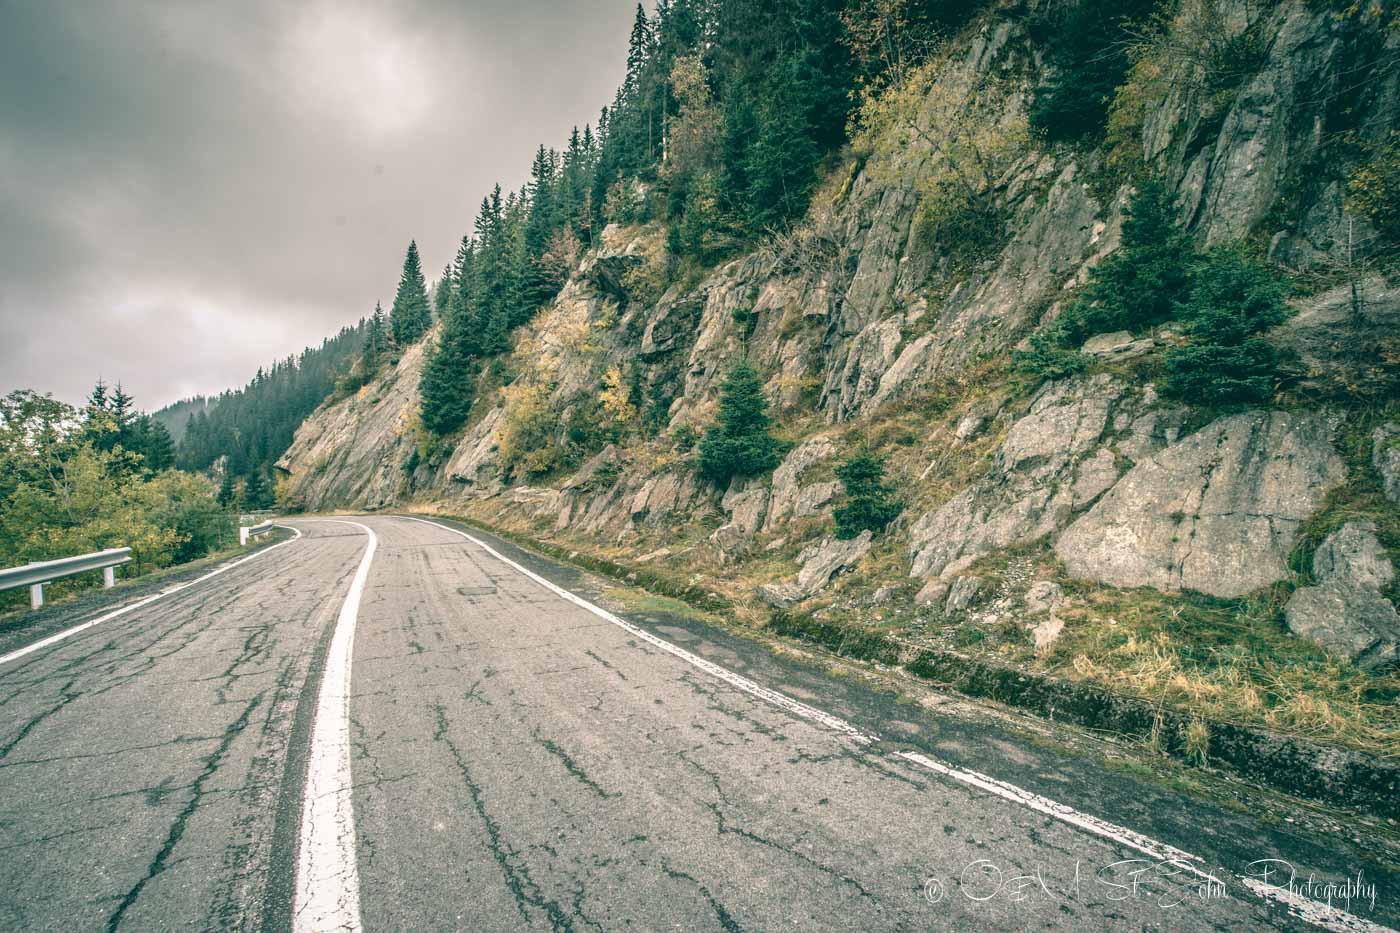 Road trip america cost